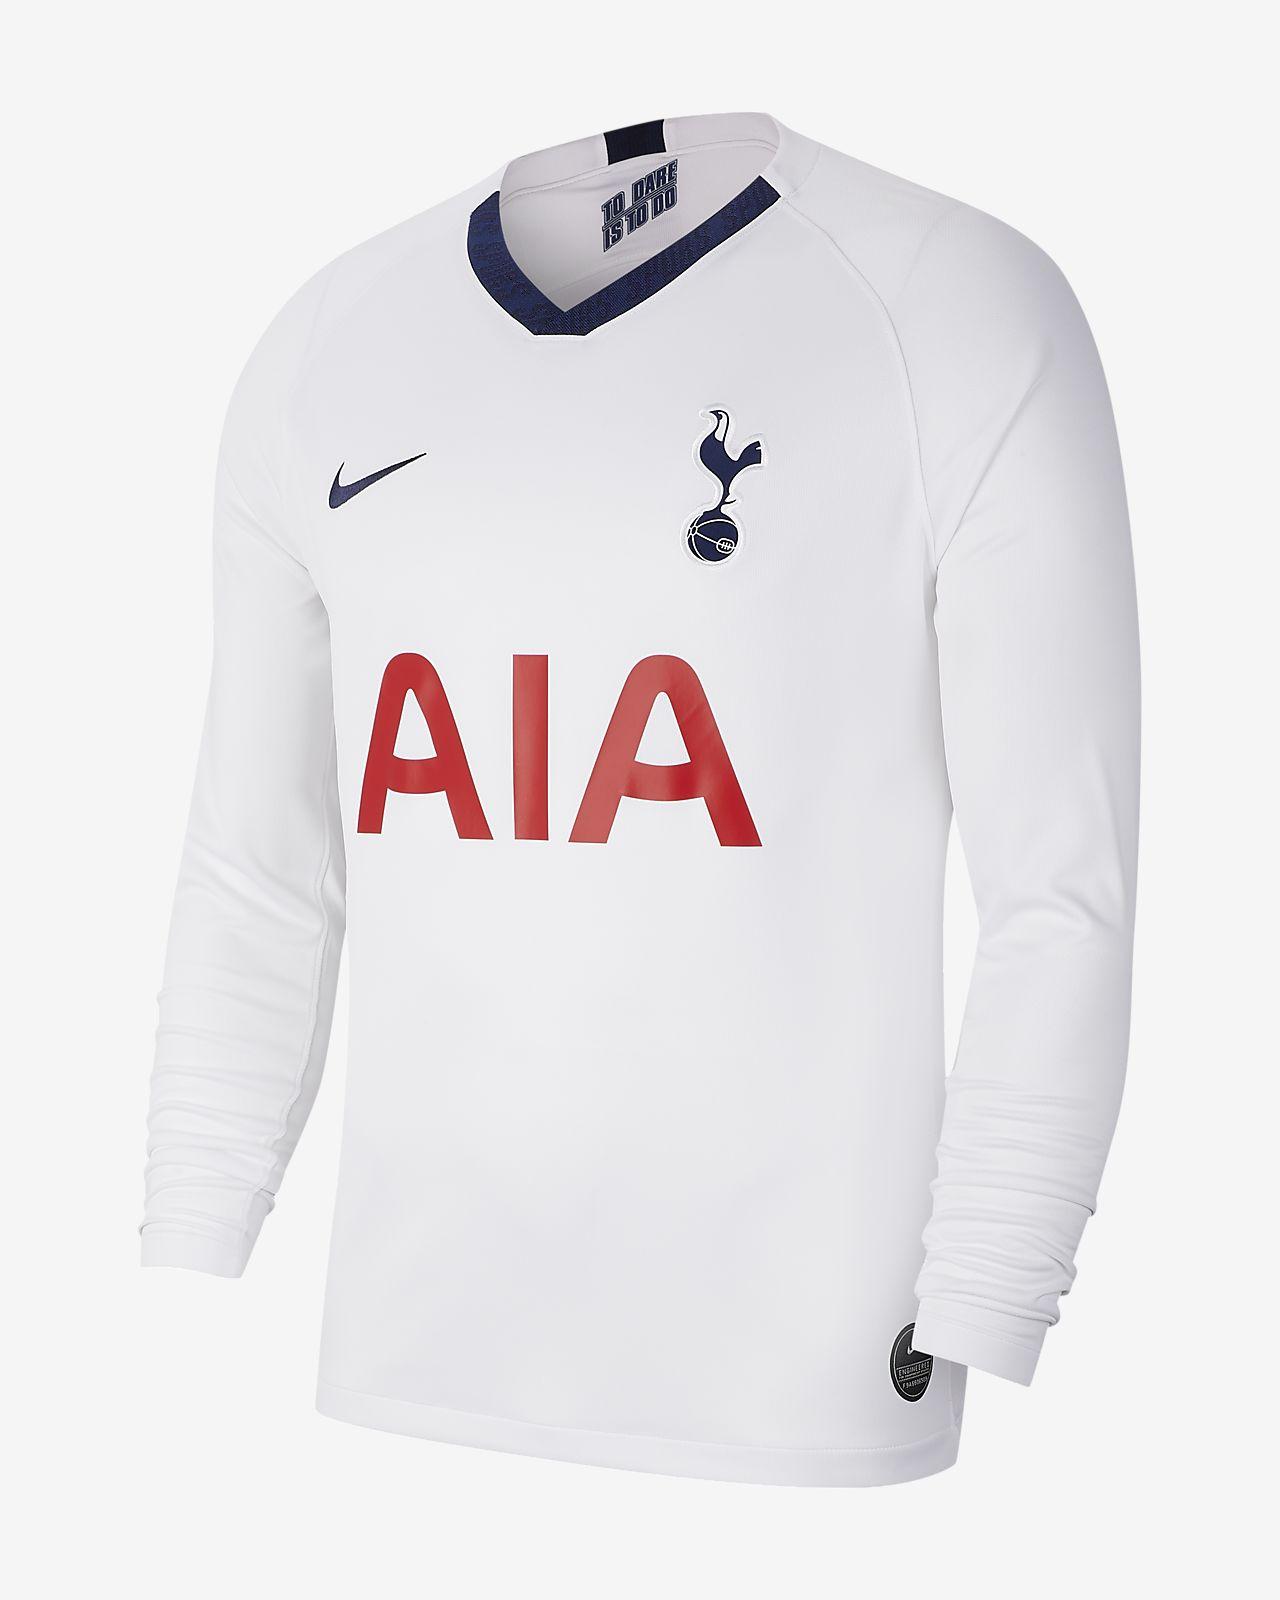 Męska koszulka piłkarska z długim rękawem Tottenham Hotspur Stadium Home 2019/20